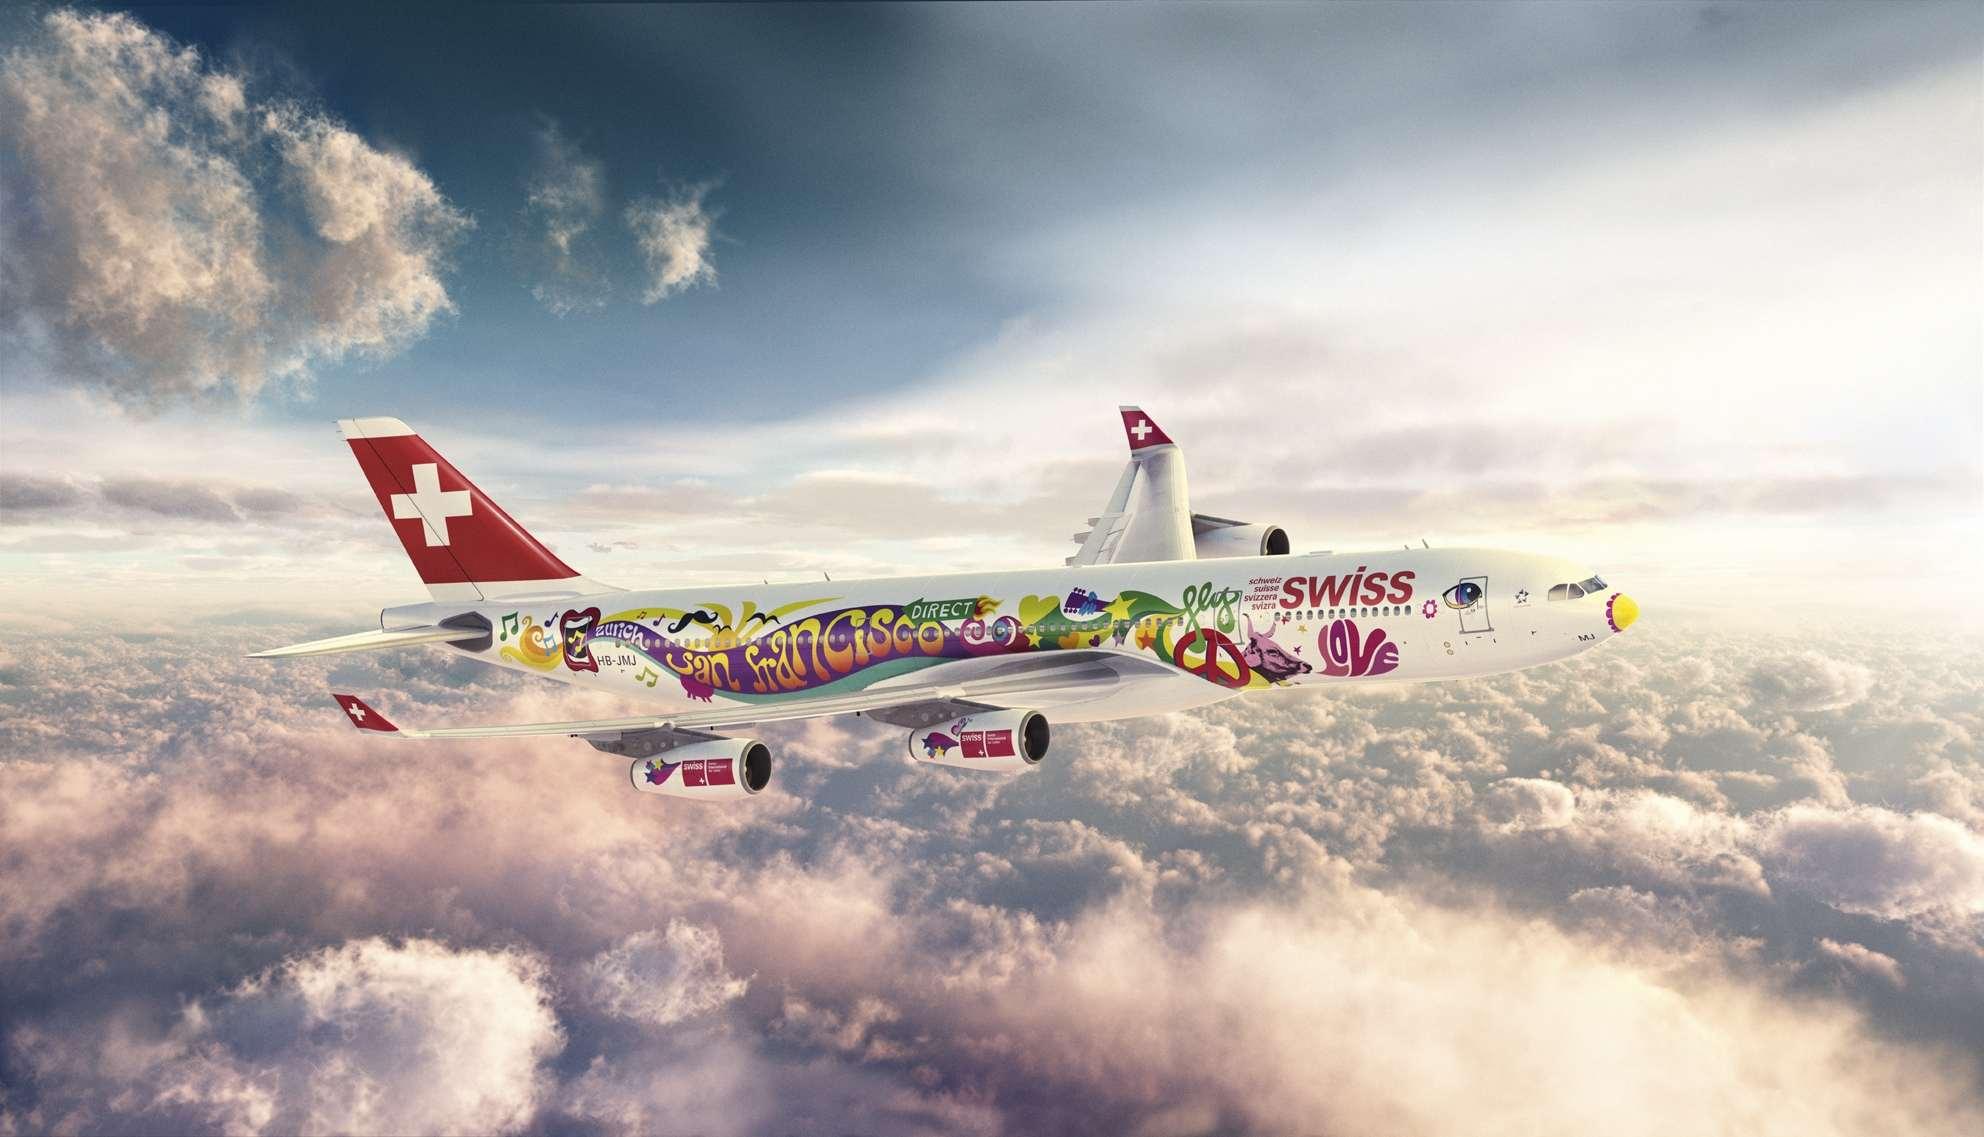 Ejemplo de Logojet en la compañía aérea  Swiss